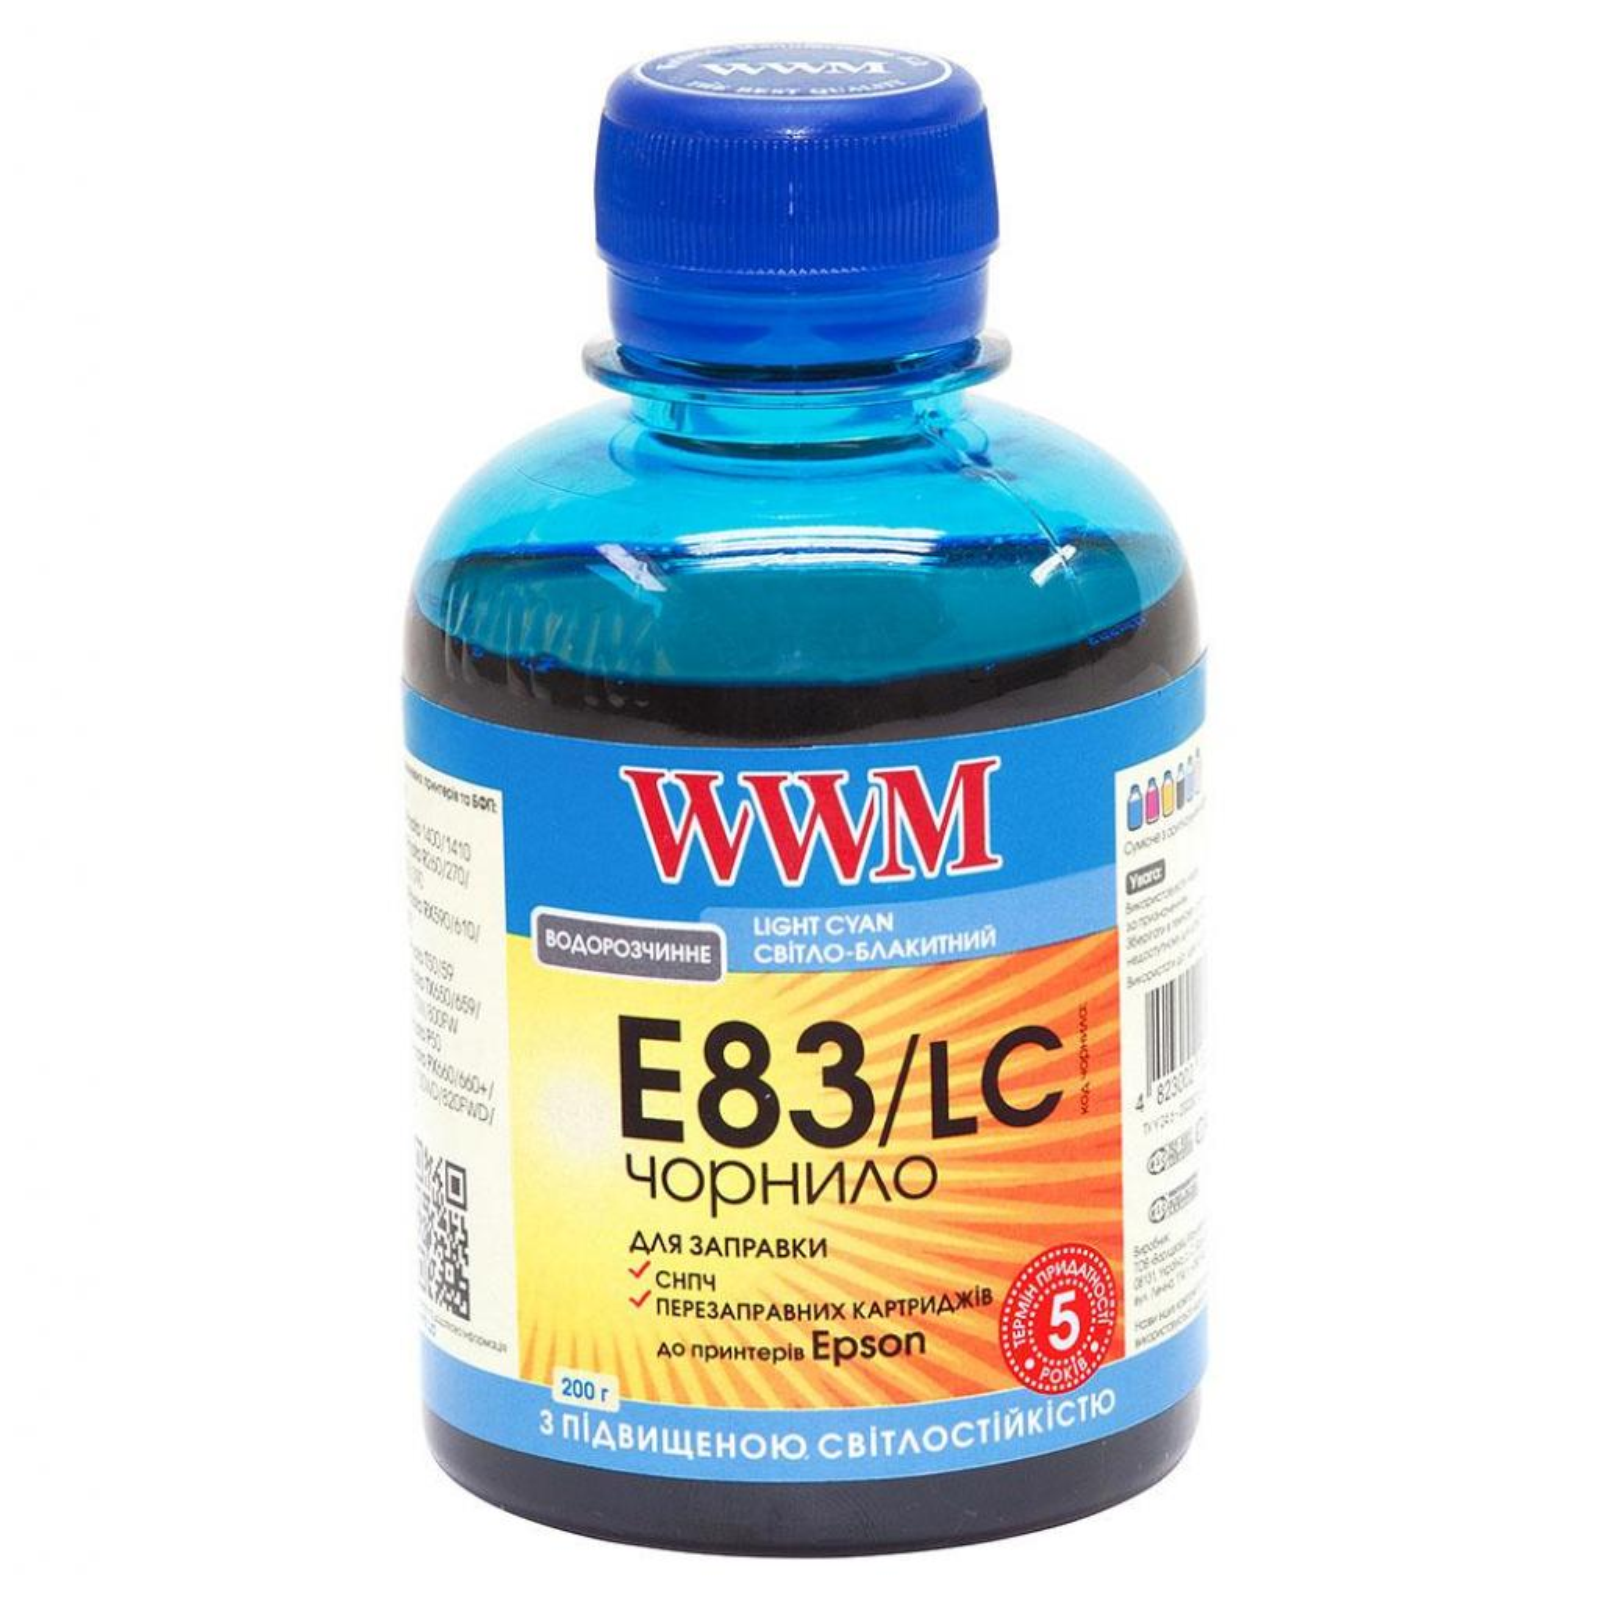 Чернила WWM EPSON StPhoto R270/290 Light CyanNEW (E83/LC)